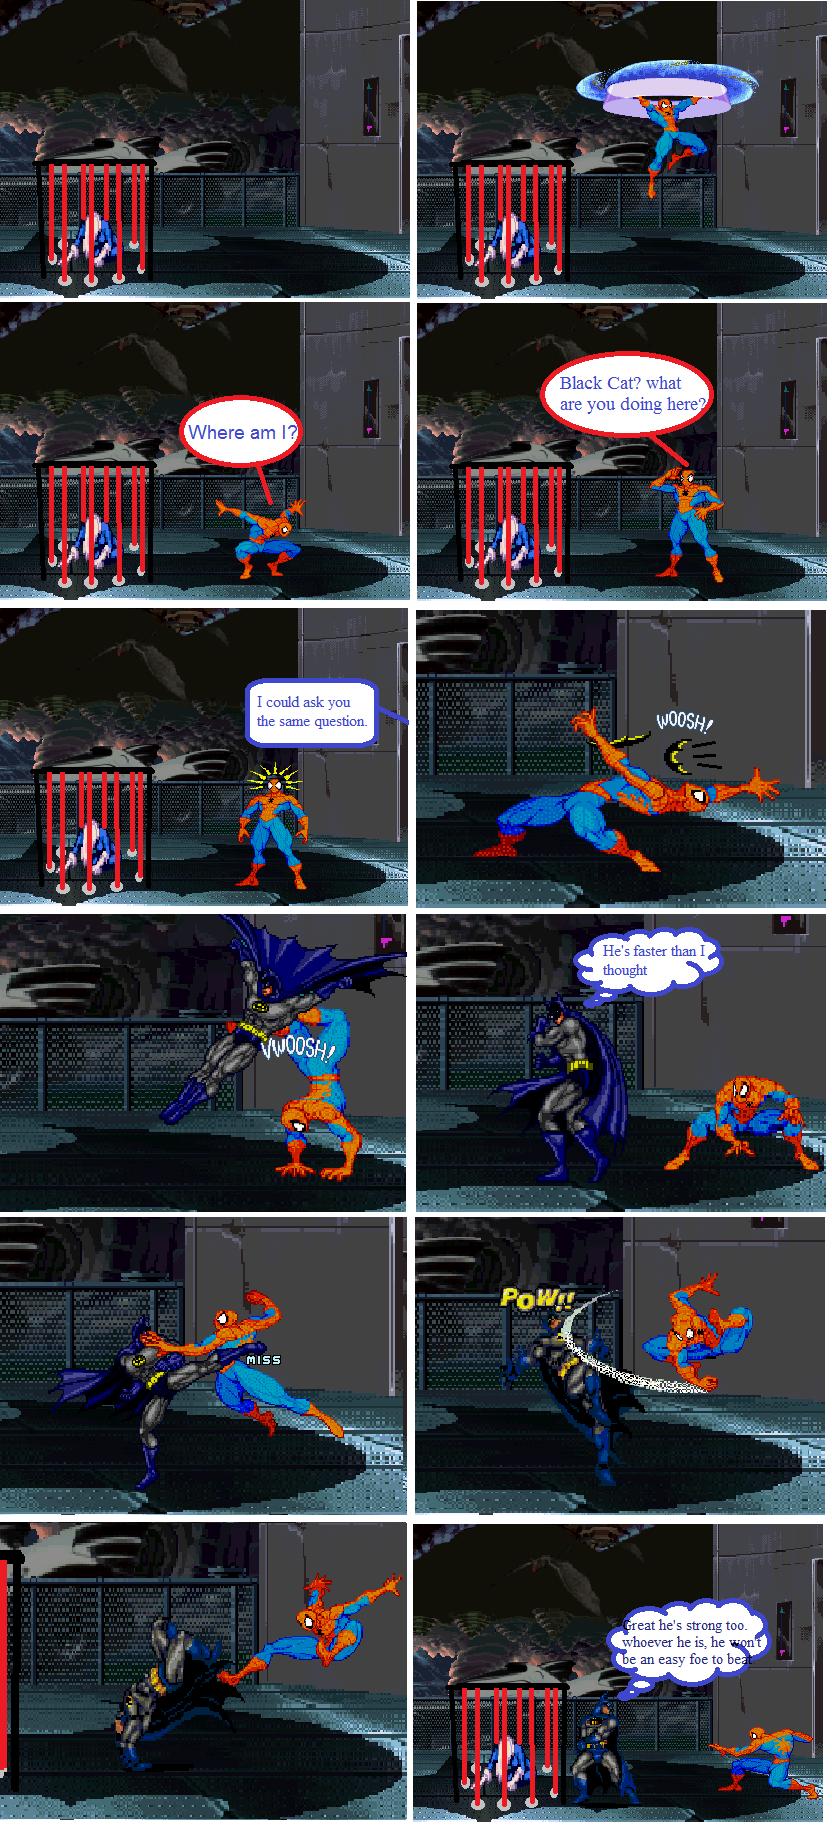 Superman vs batman vs spiderman